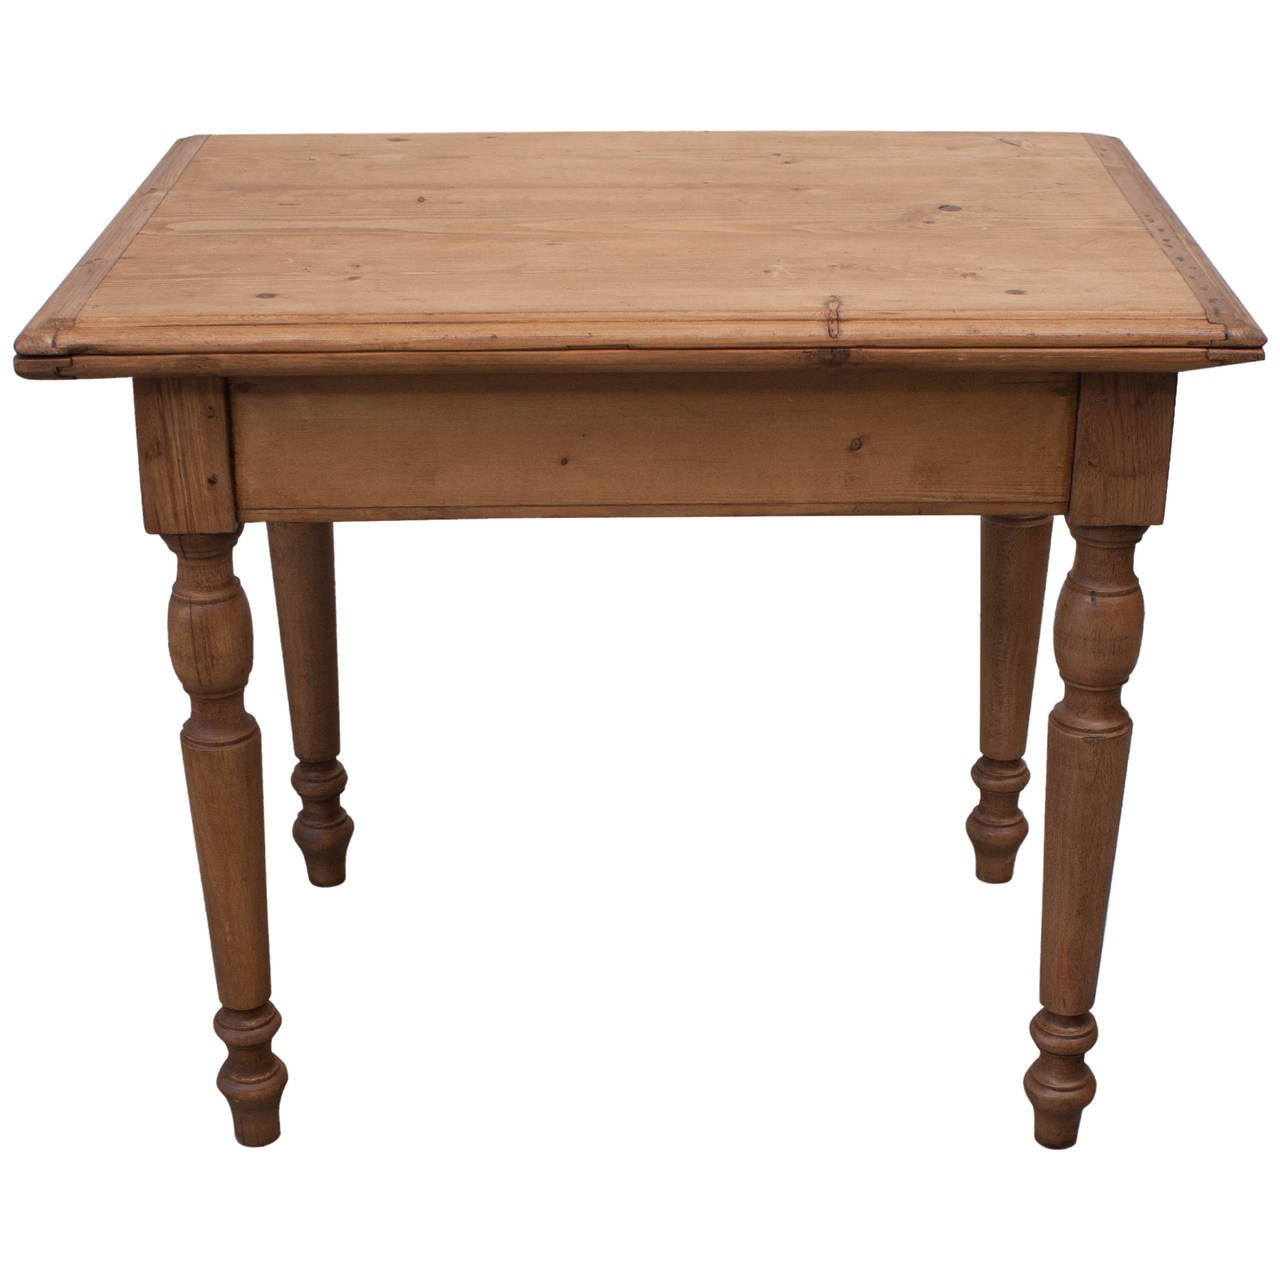 Pine And Beechwood Swivel Top Table At 1stdibs